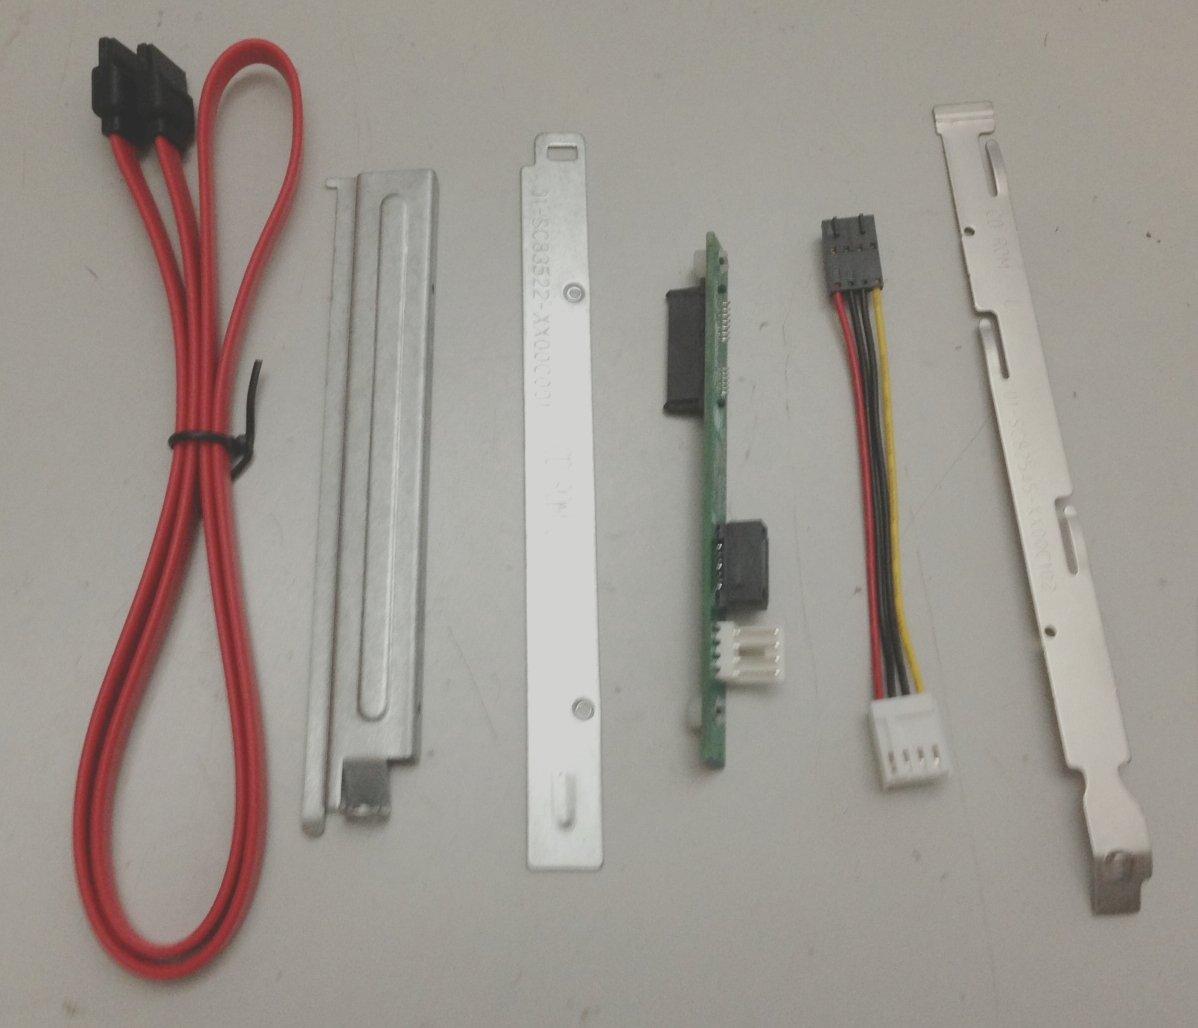 Amazon.com: Supermicro Accessory MCP-220-81502-0N DVD SATA Kit SC815 ...